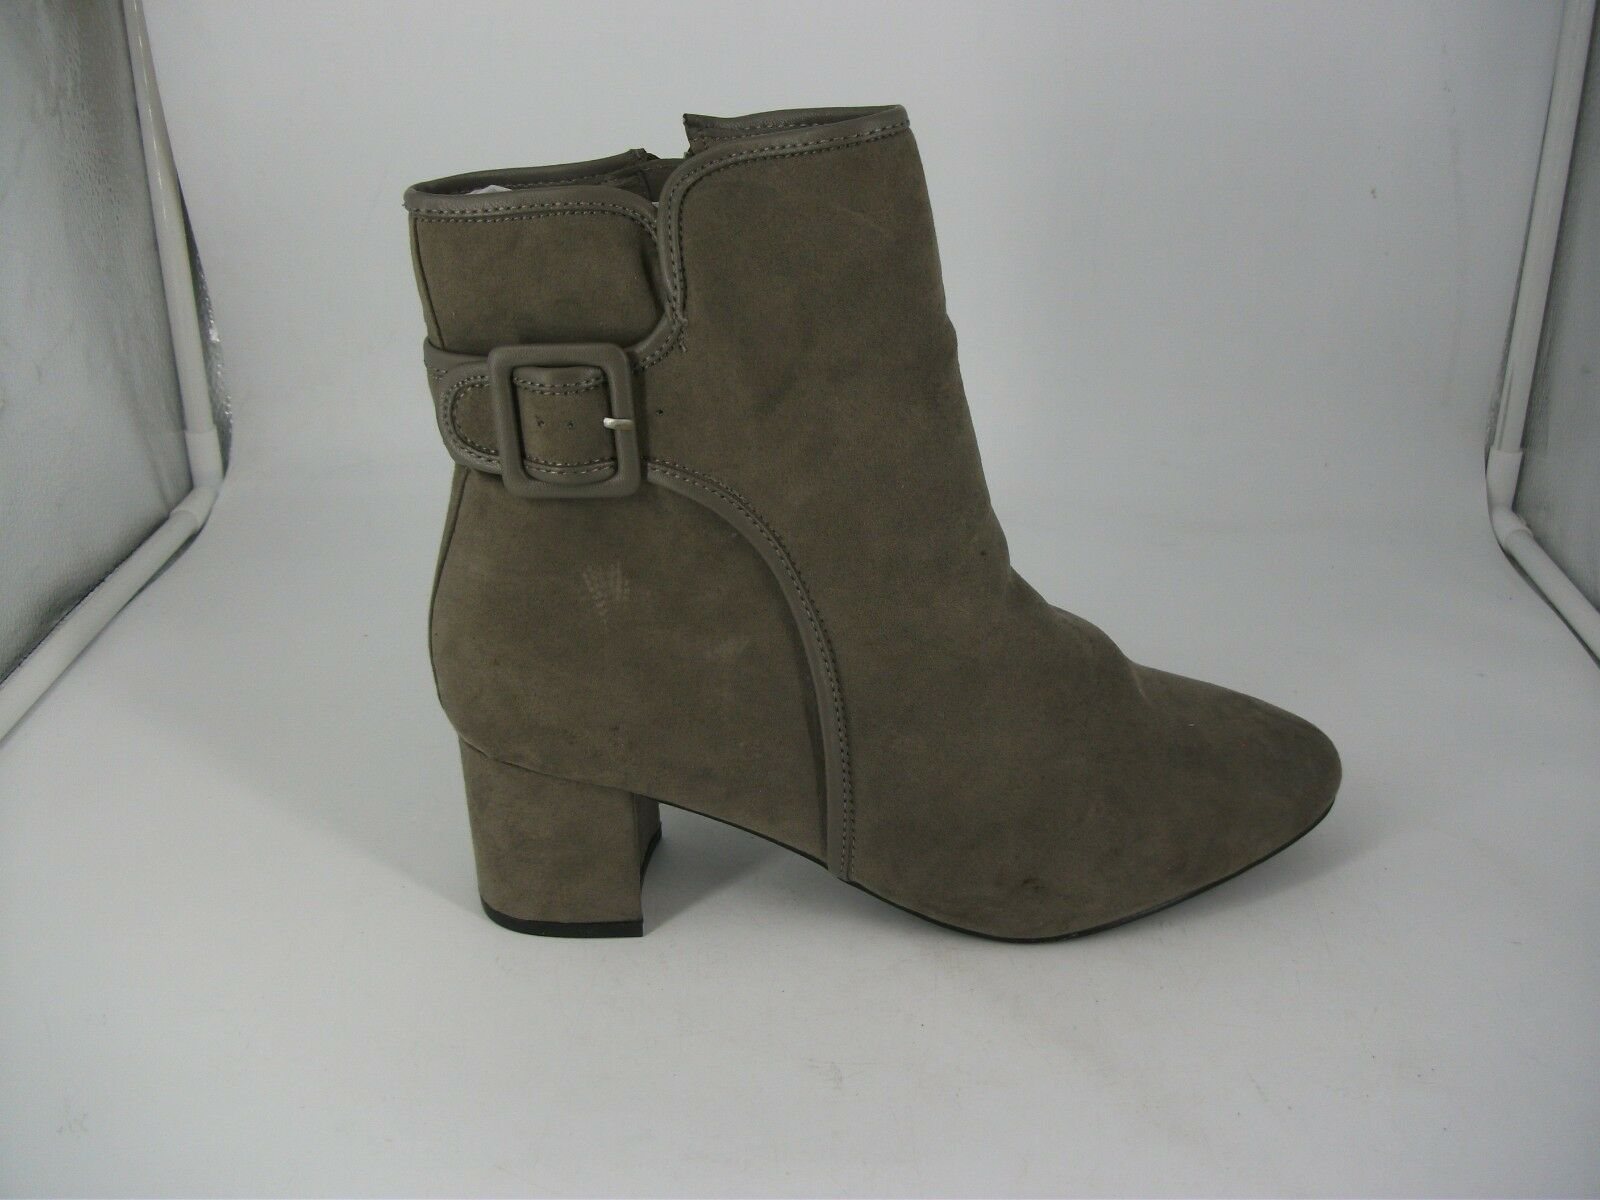 Evans DARCY Grey Suedette Buckle Ankle Boots UK 10 STD Fit JS092 TT 04